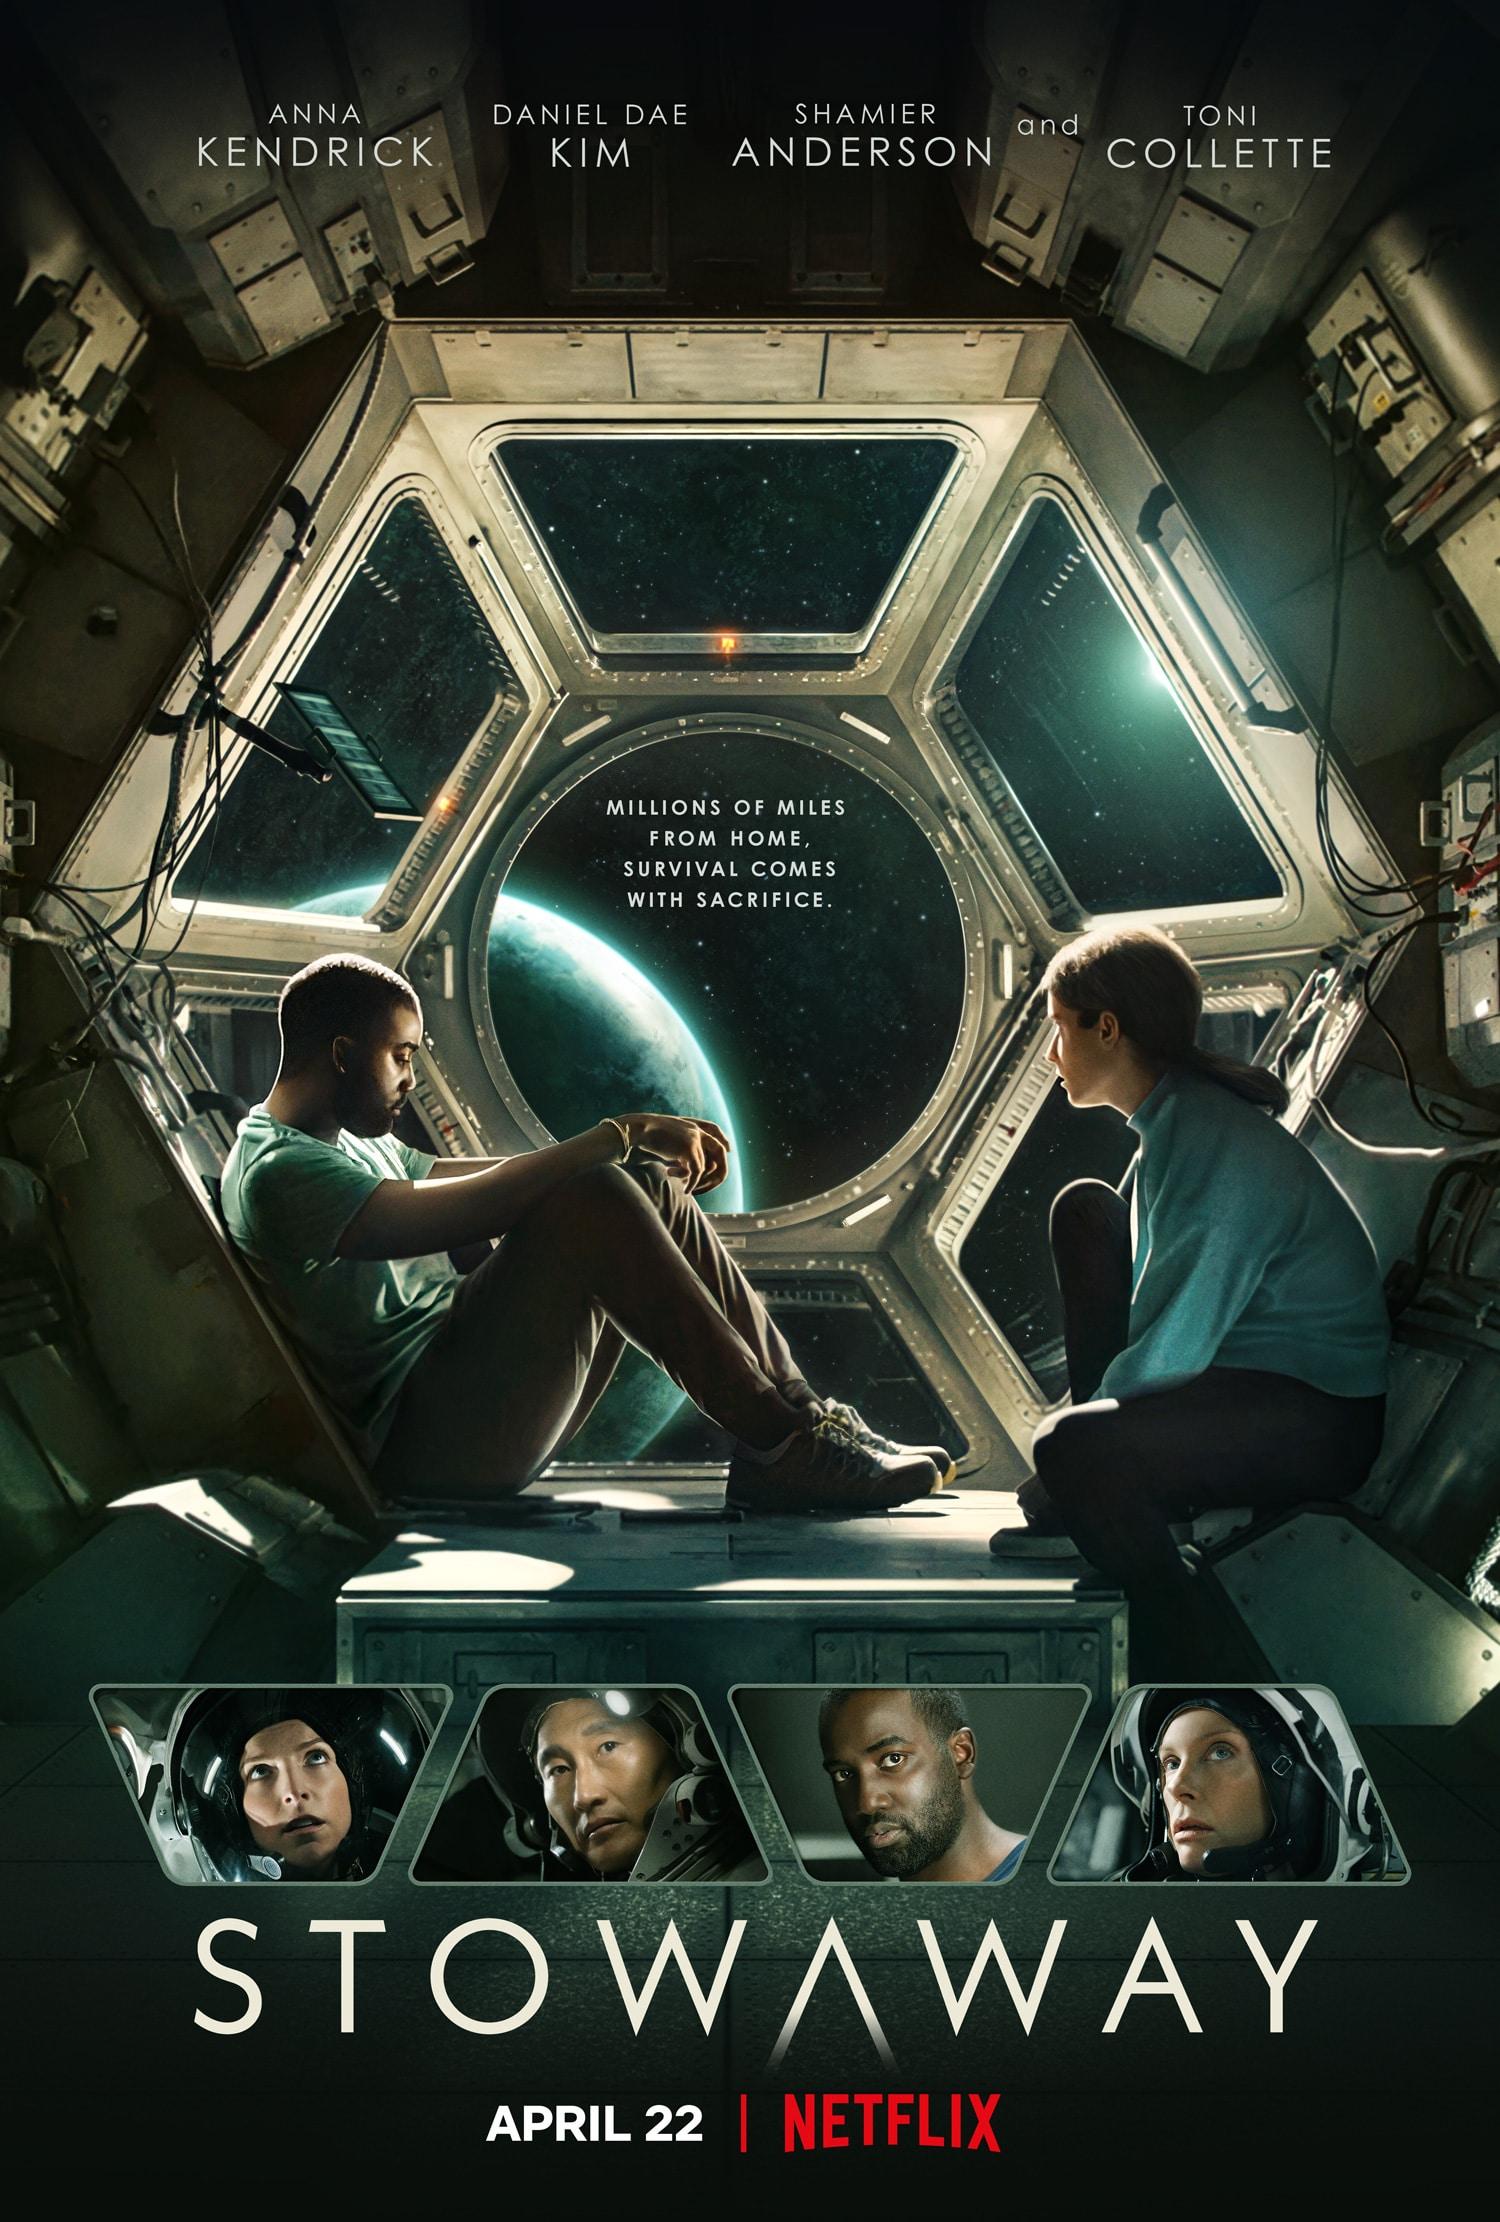 Stowaway - Film 2021 - Scary-Movies.de